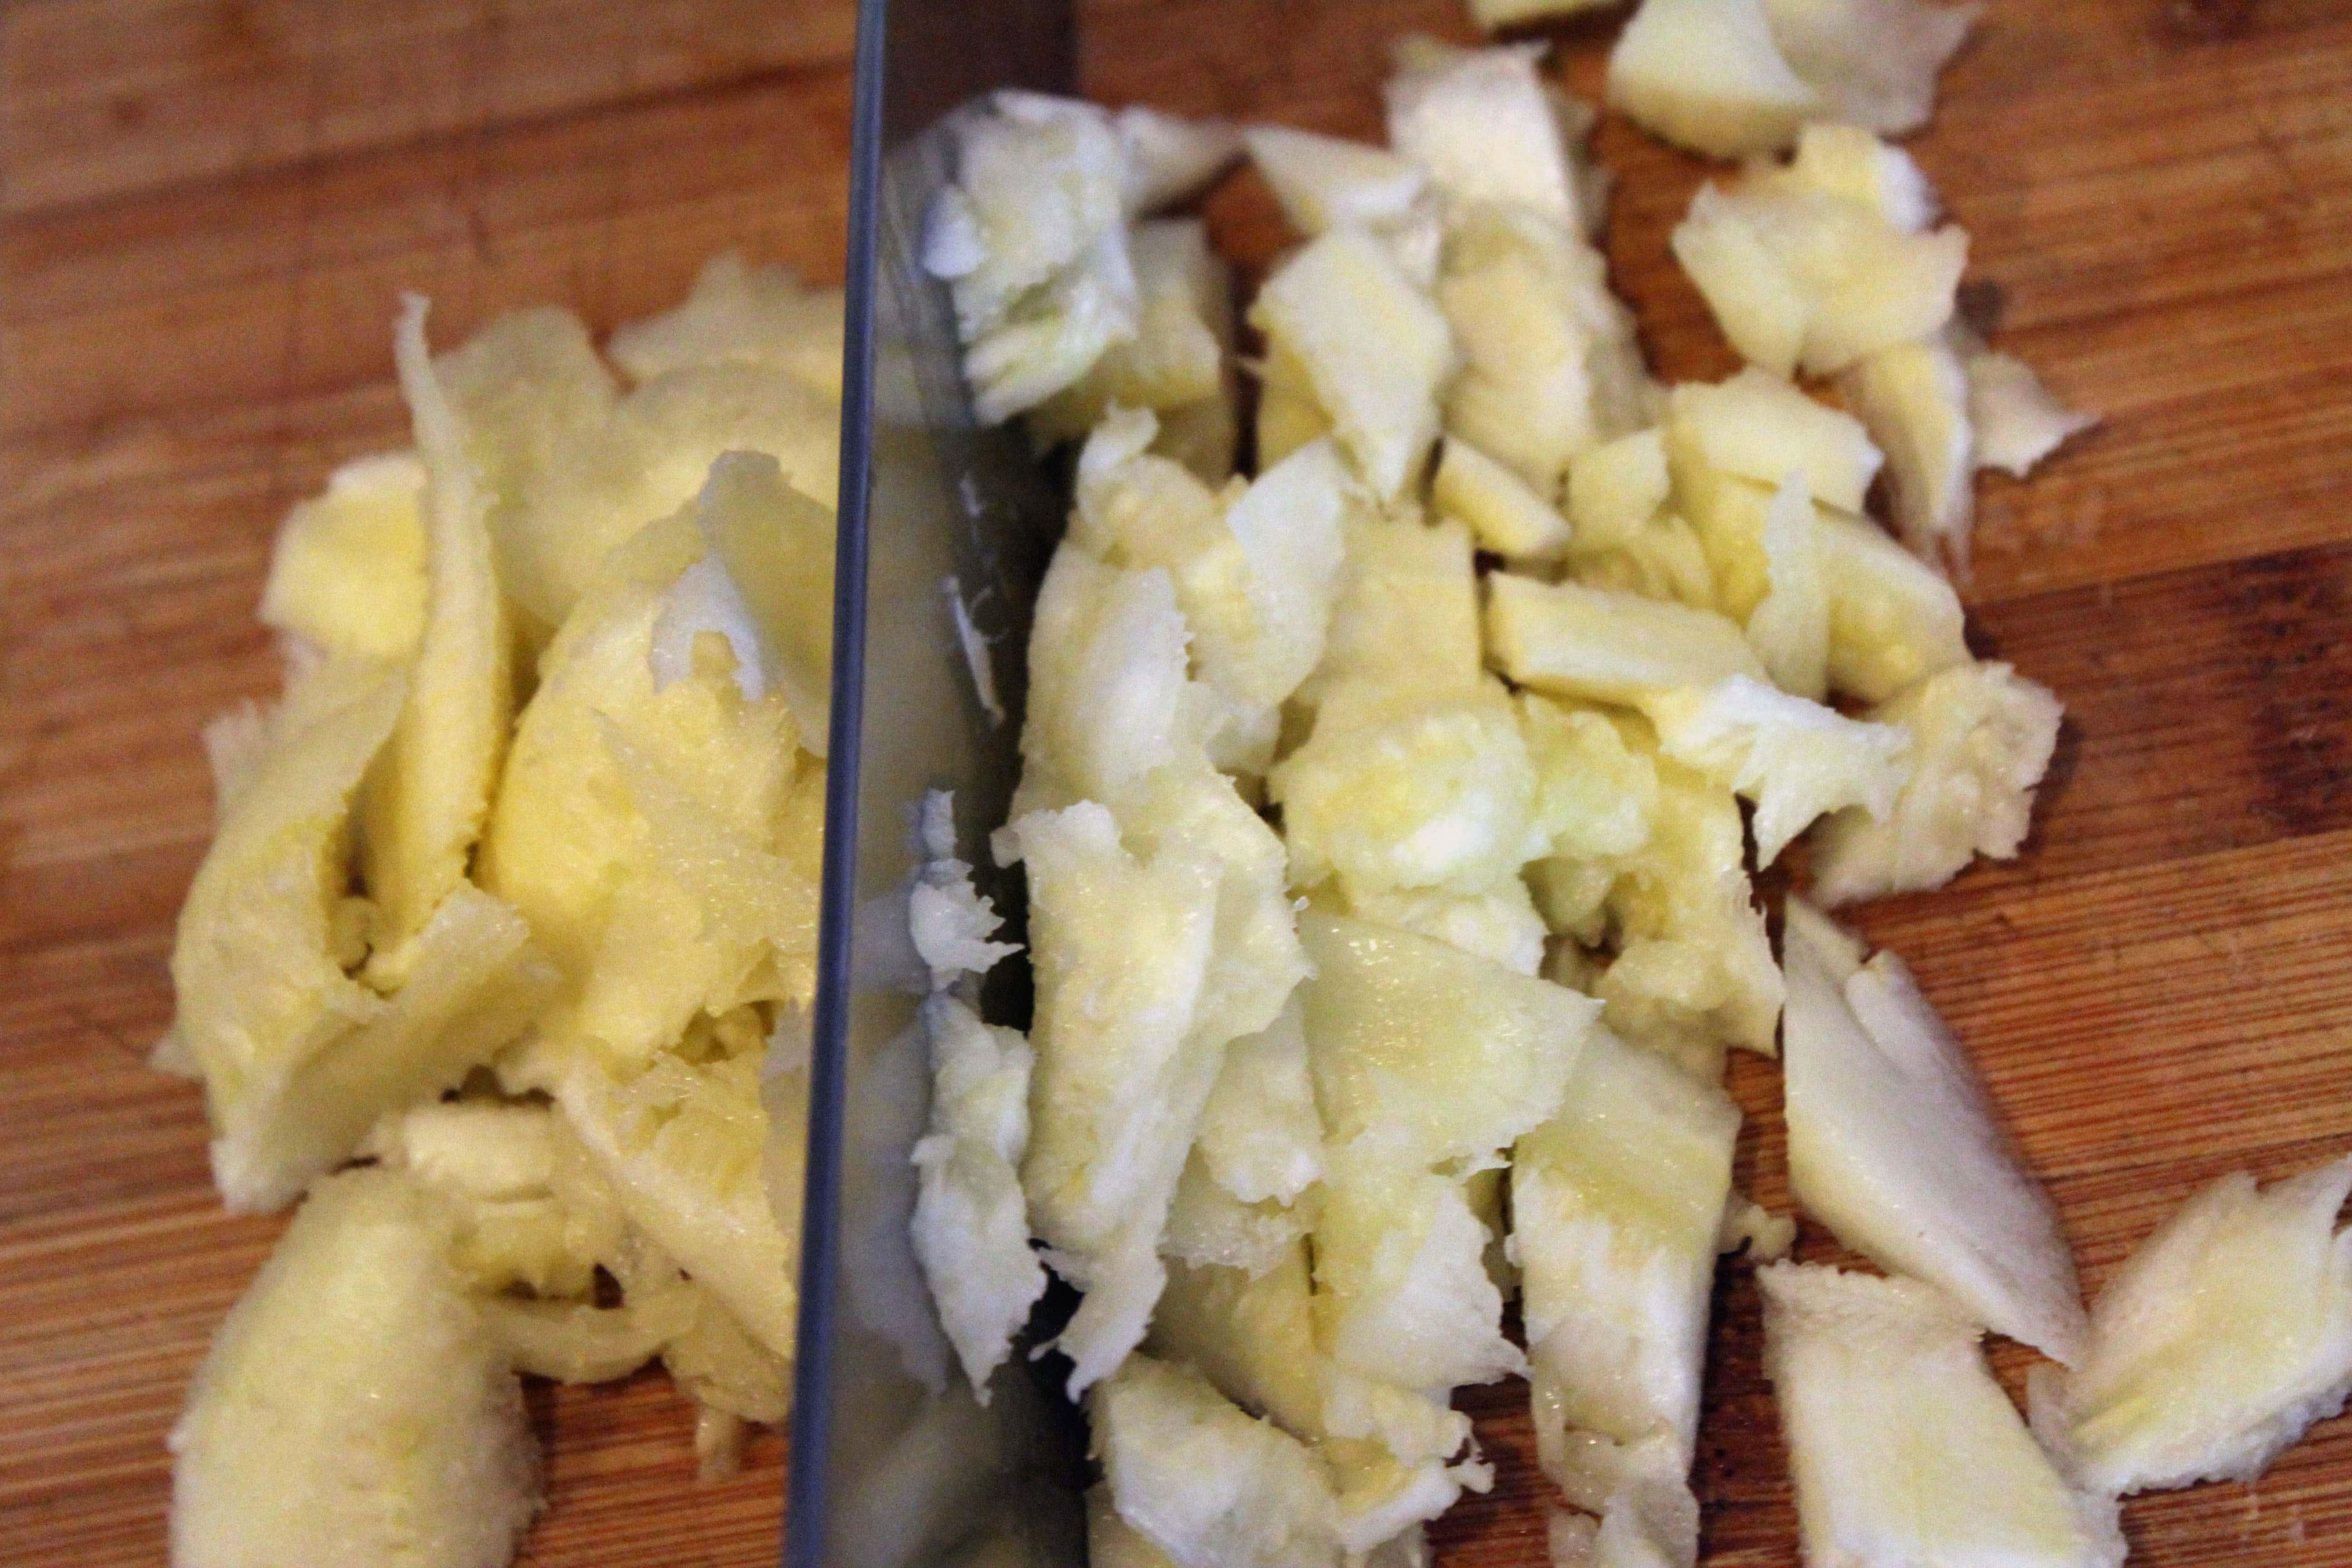 Roughly chop zucchini flesh